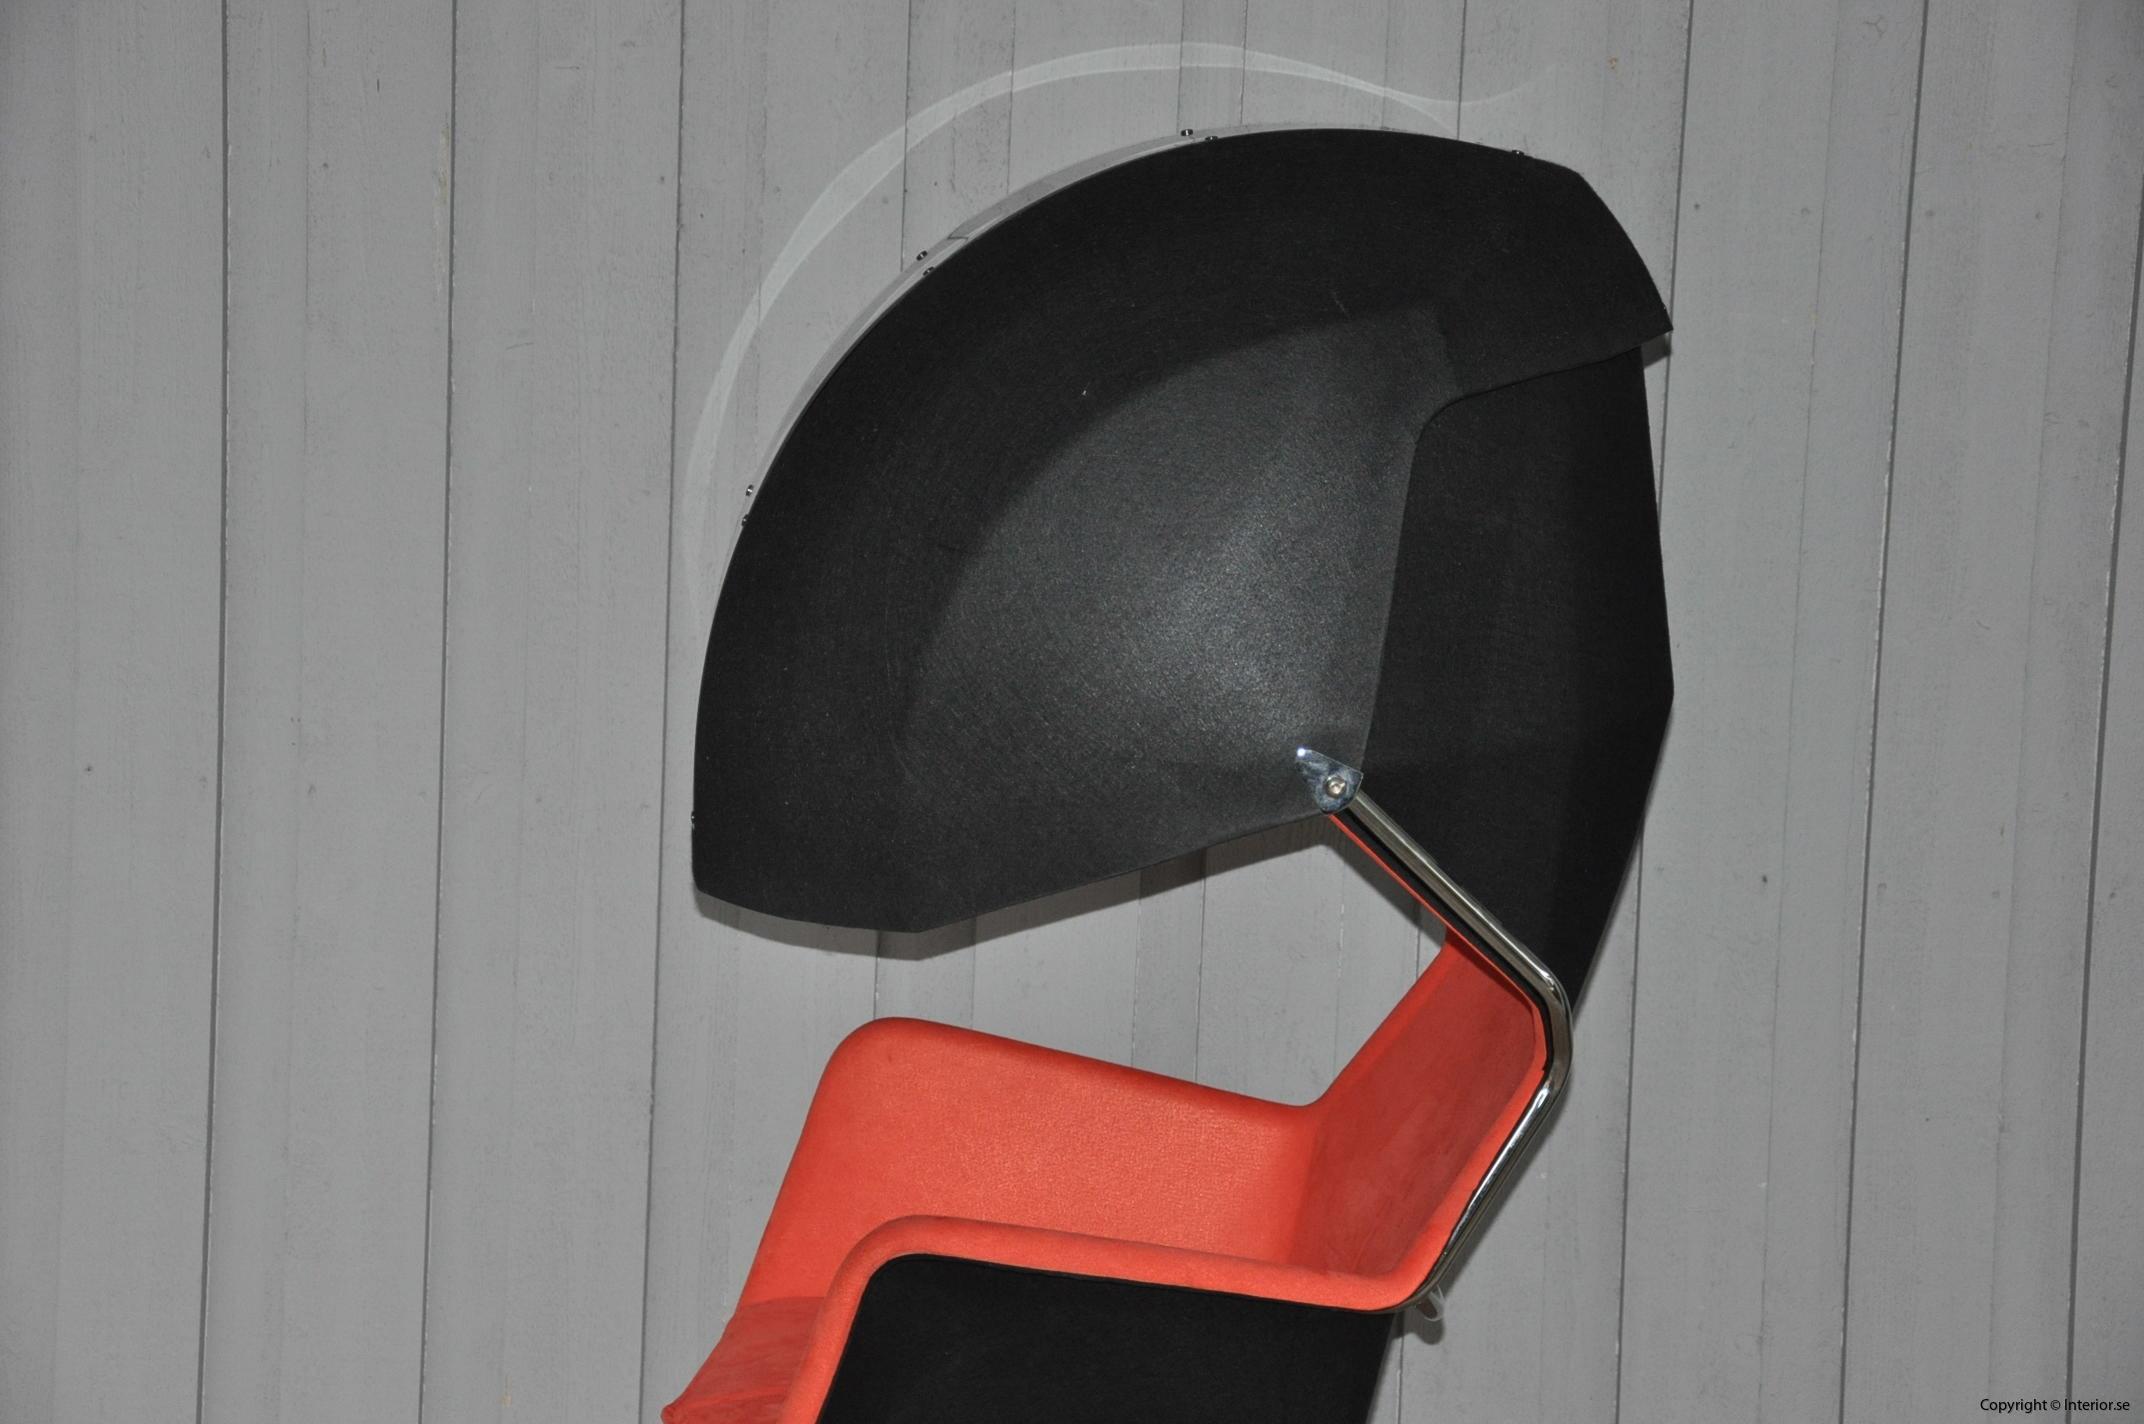 Fåtöljer sessel armchair Blå Station Peekaboo - Flera Färger - Stefan Borselius (5)